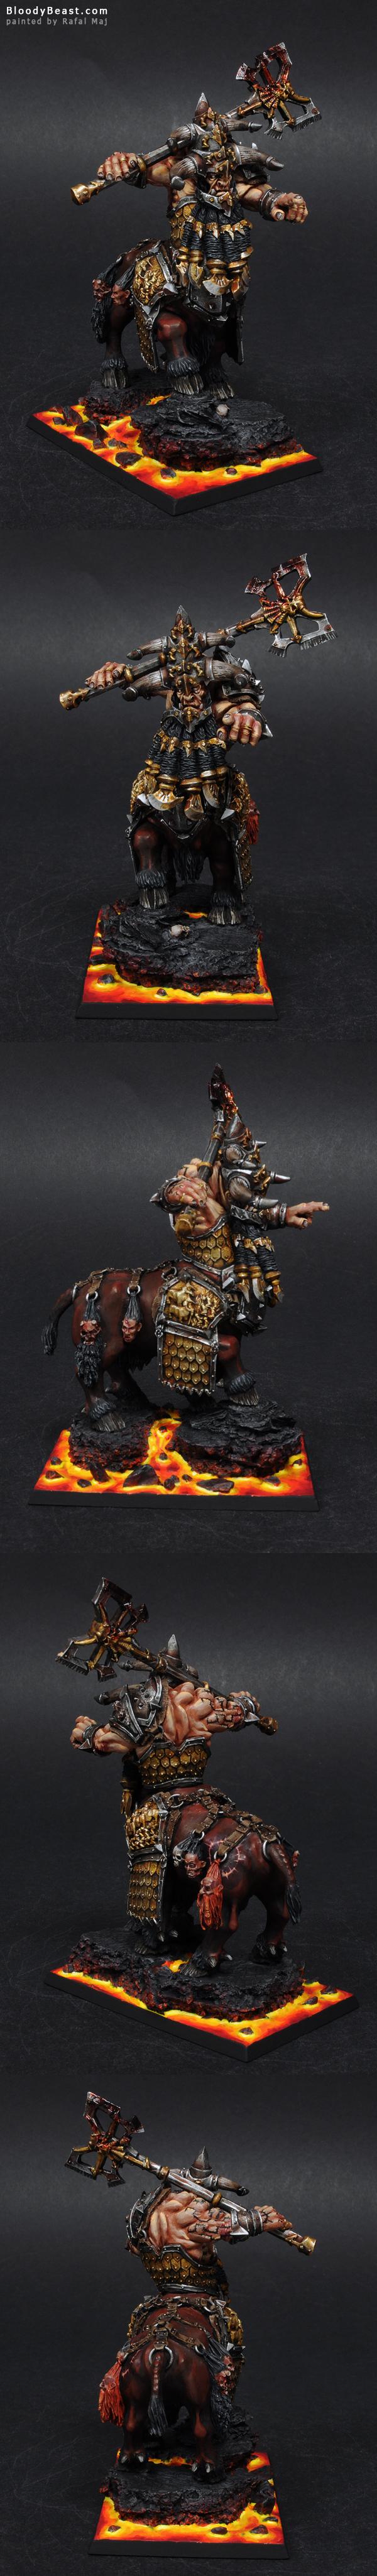 Forge World Chaos Dwarf Bull Centaur Taur'ruk painted by Rafal Maj (BloodyBeast.com)